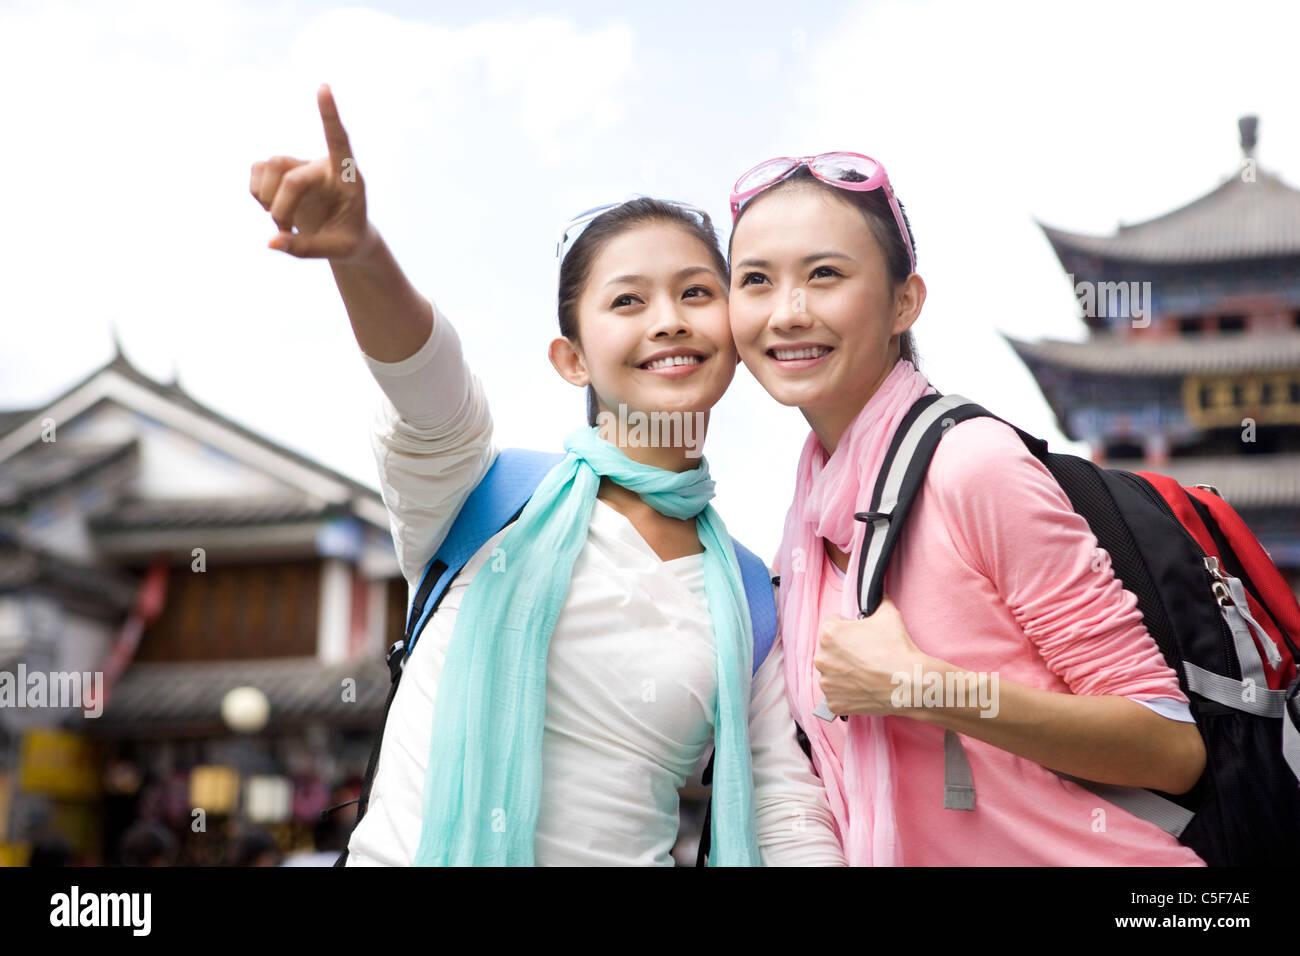 Two Friends Exploring Dali - Stock Image